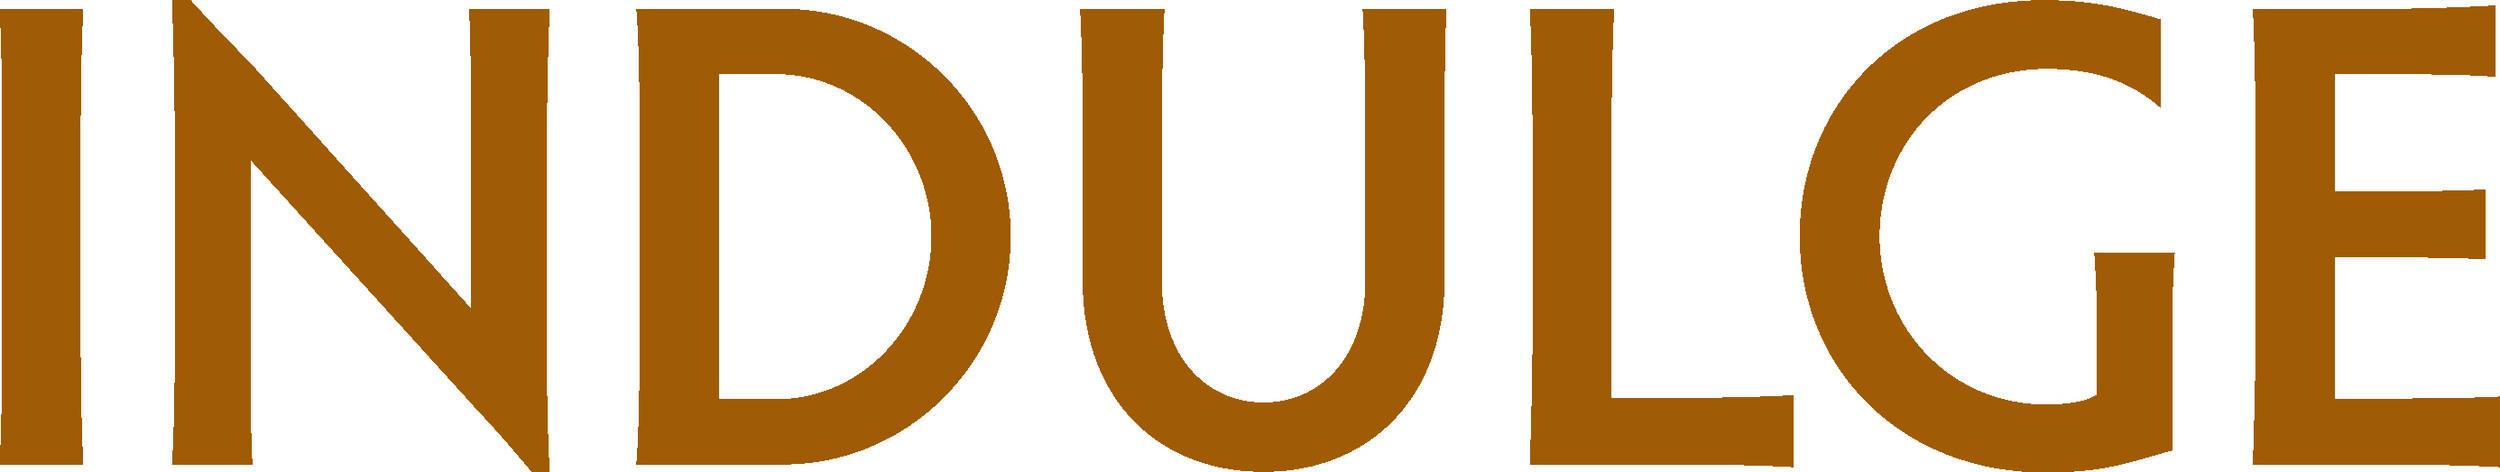 Indulge logo gold.jpg